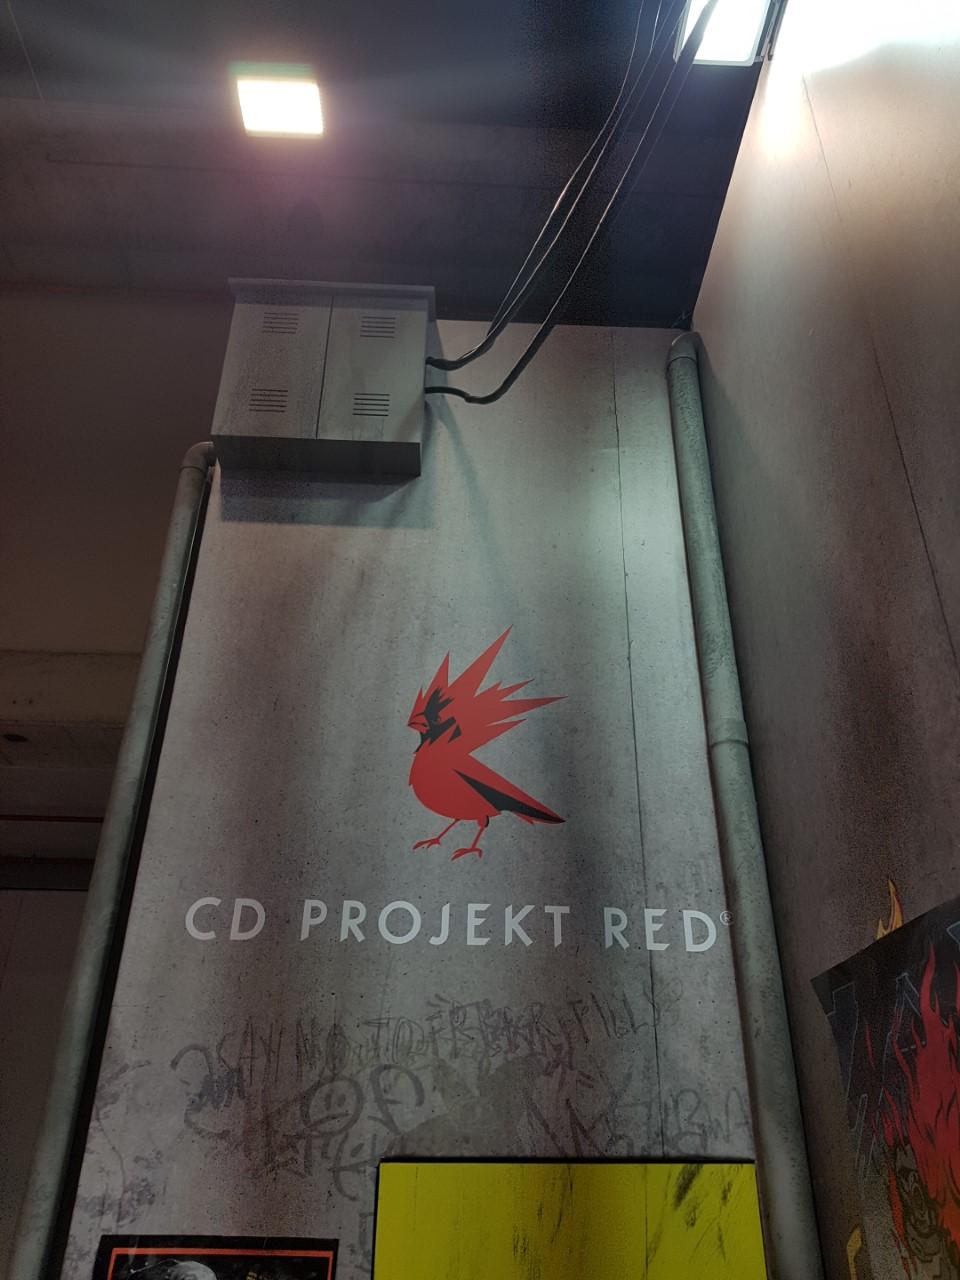 Así lucía la entrada del Stand de Cyberpunk 2077 - Cyberpunk 2077 gameplay